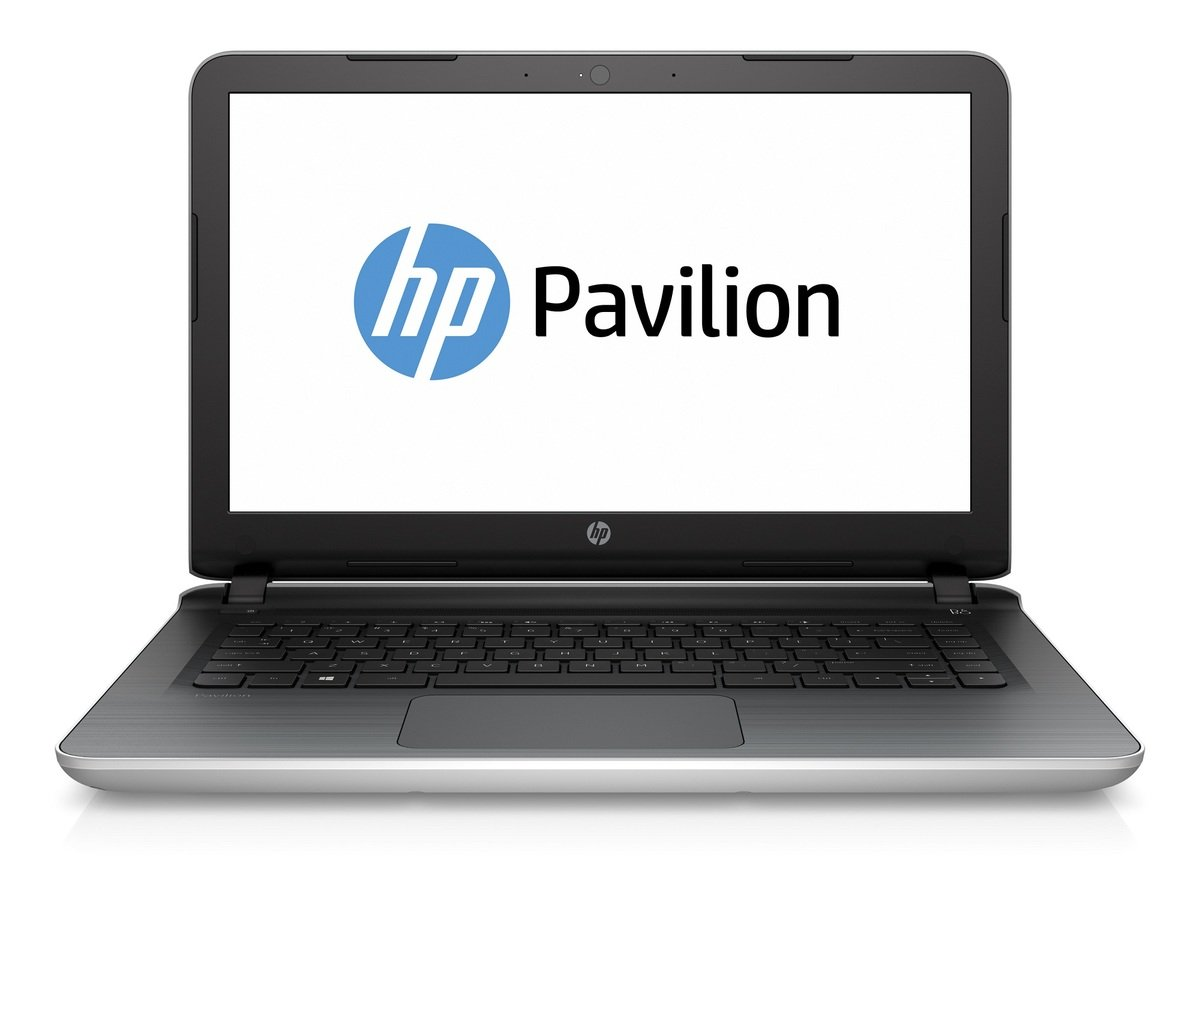 Pavilion 14-ab149TX 筆記簿型電腦